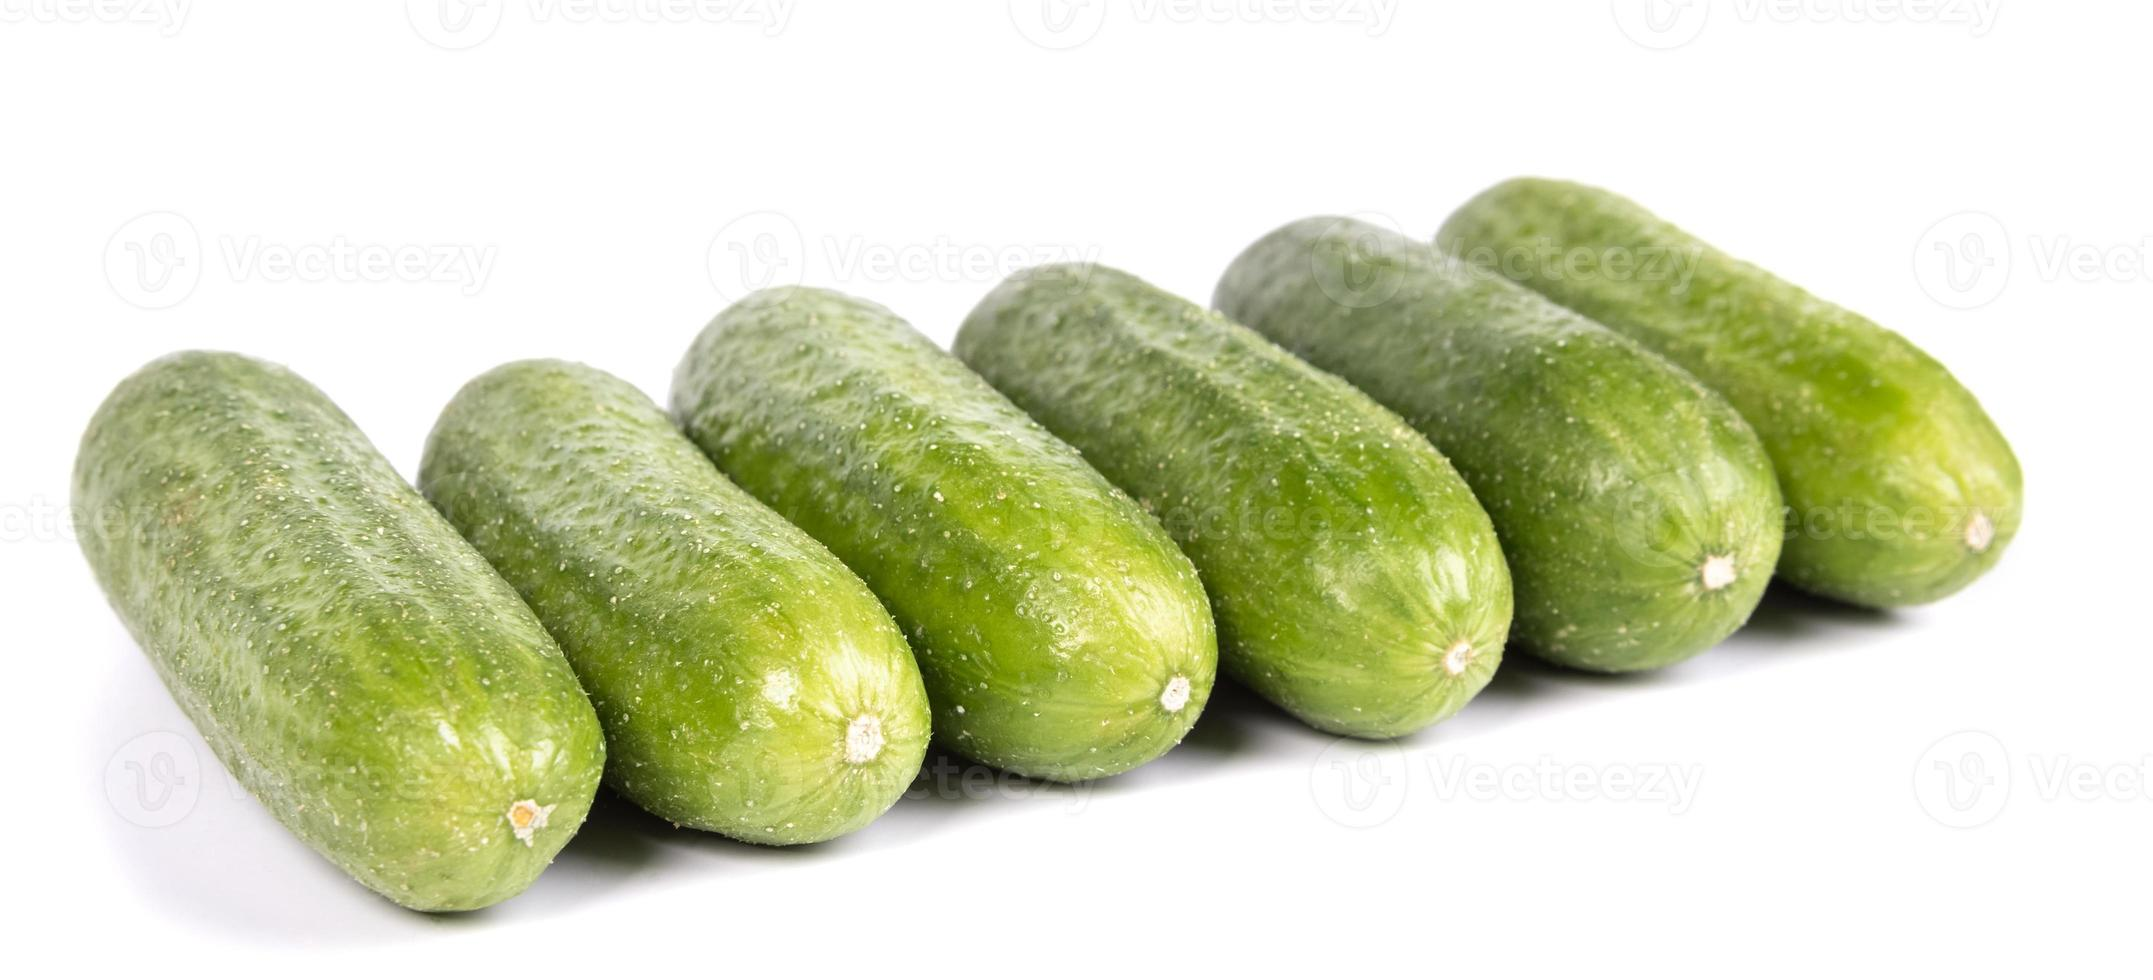 green cucumber photo